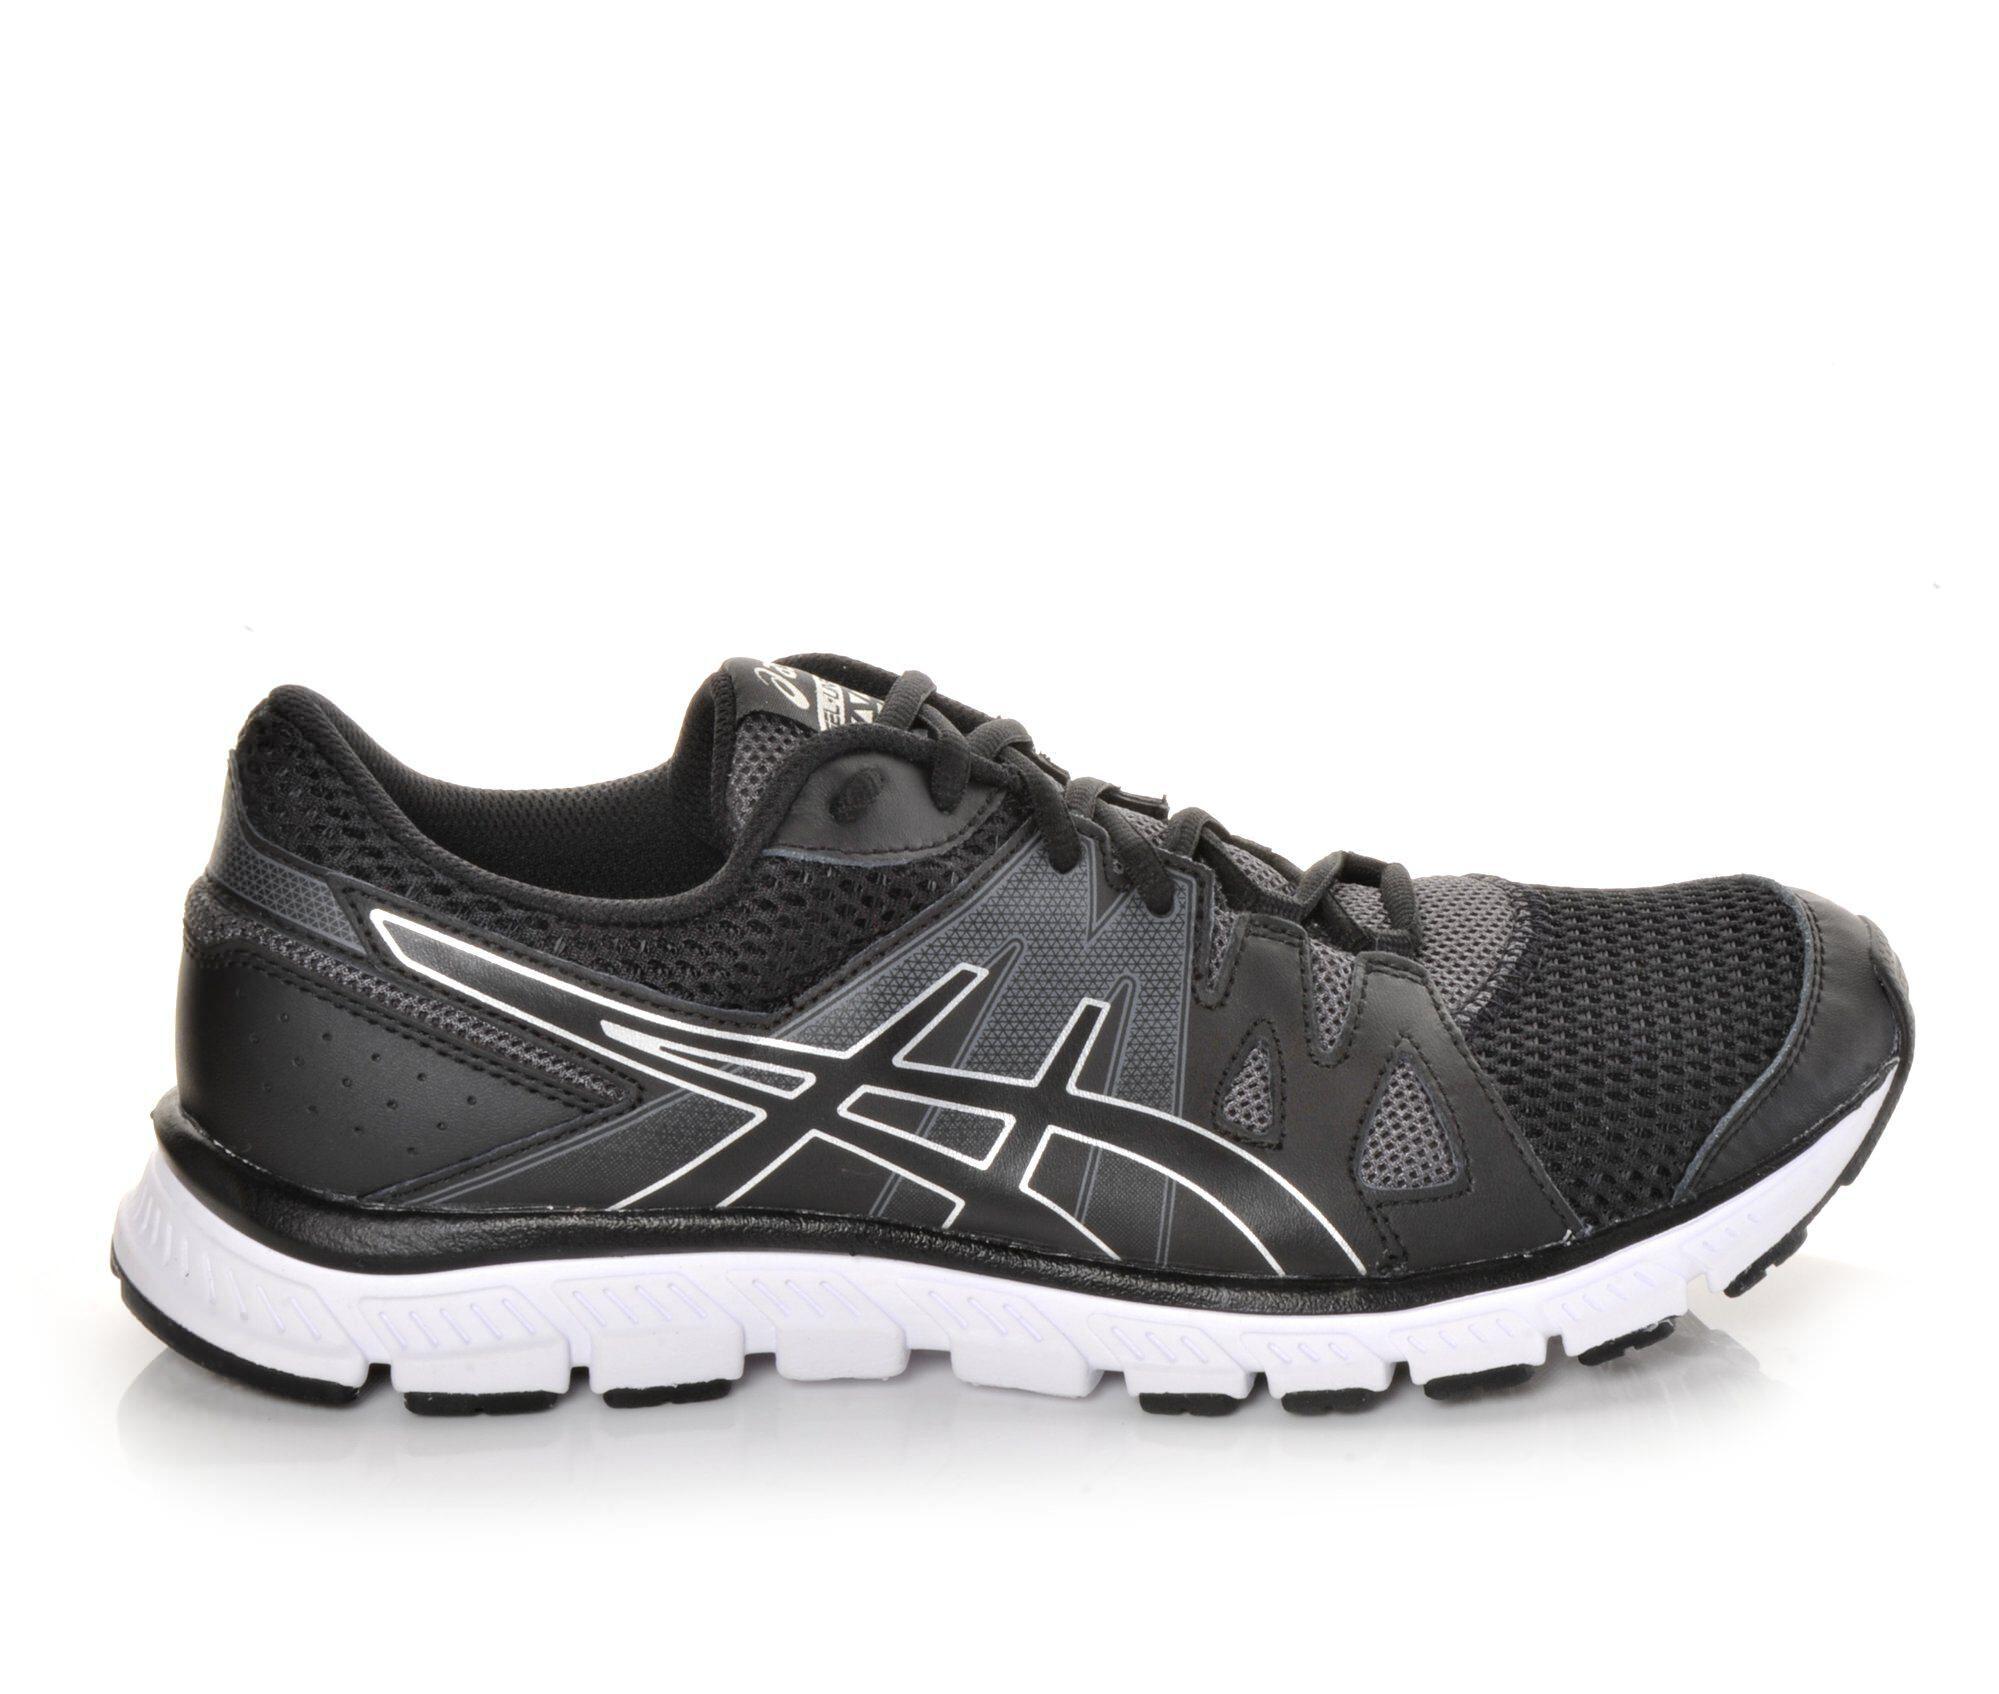 Men\u0027s Asics Gel Unifire TR Training Shoes